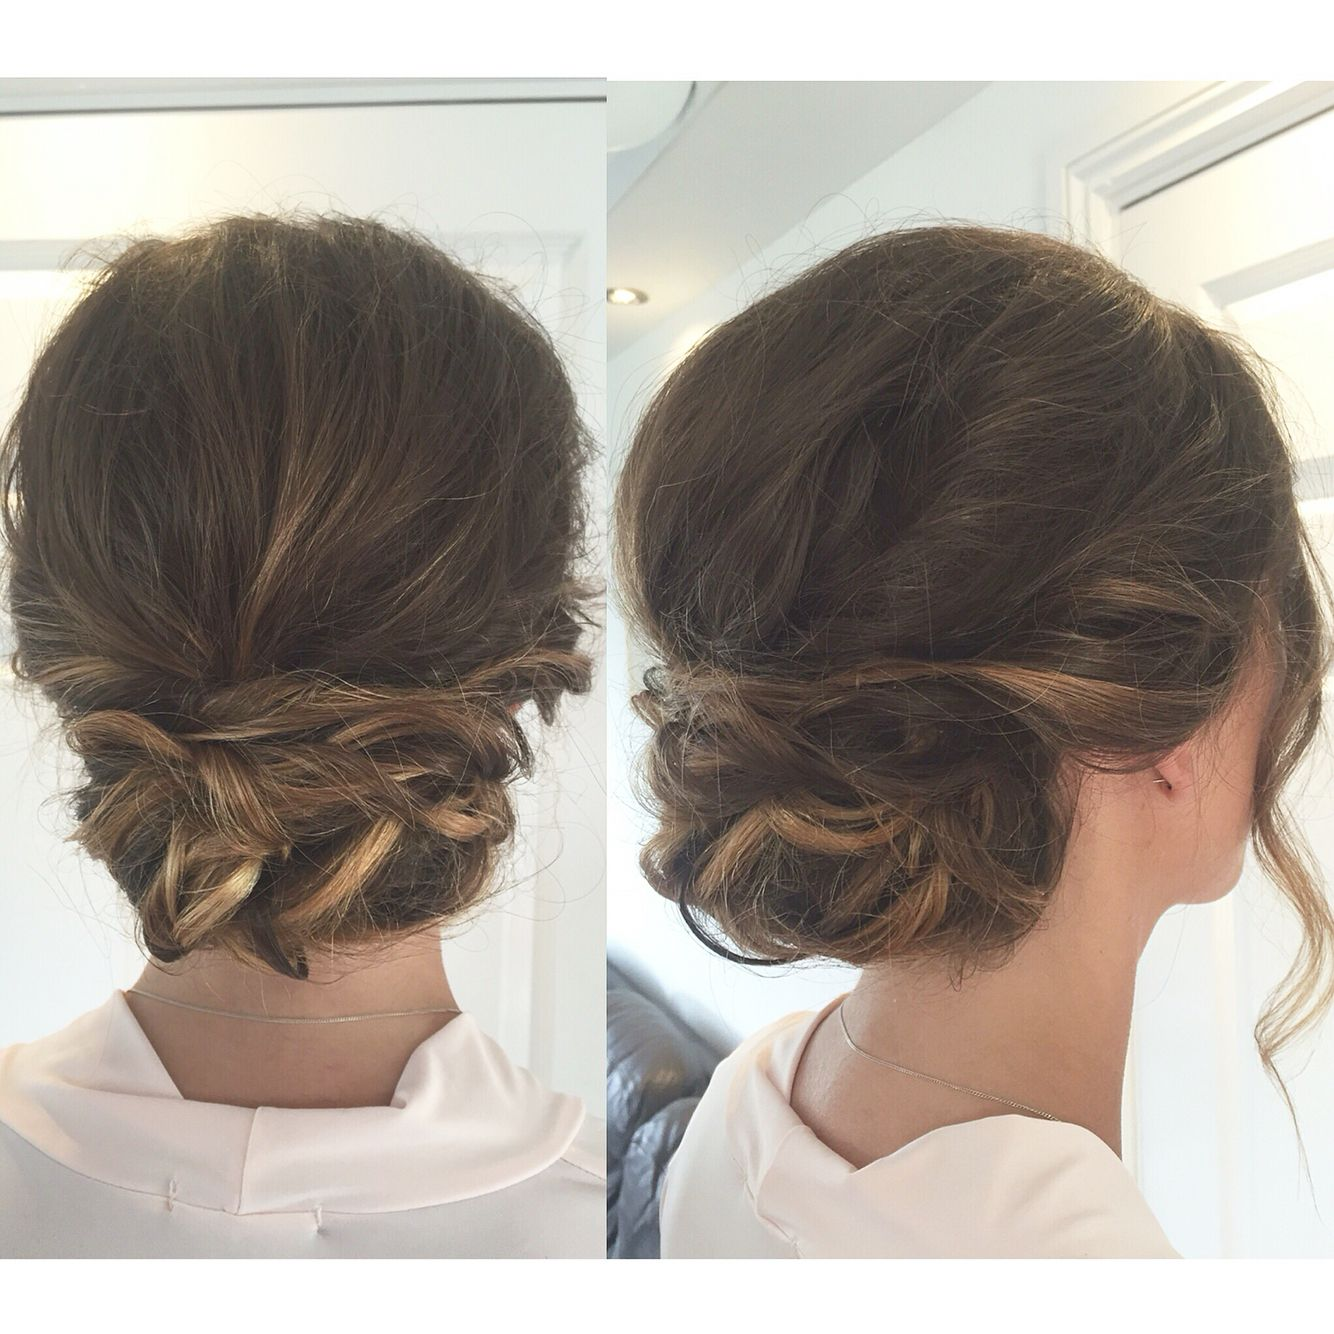 Bridesmaid Hair Up Beachy Twists Hairstyles For Medium Length Hair Easy Medium Length Hair Styles Easy Updos For Medium Hair